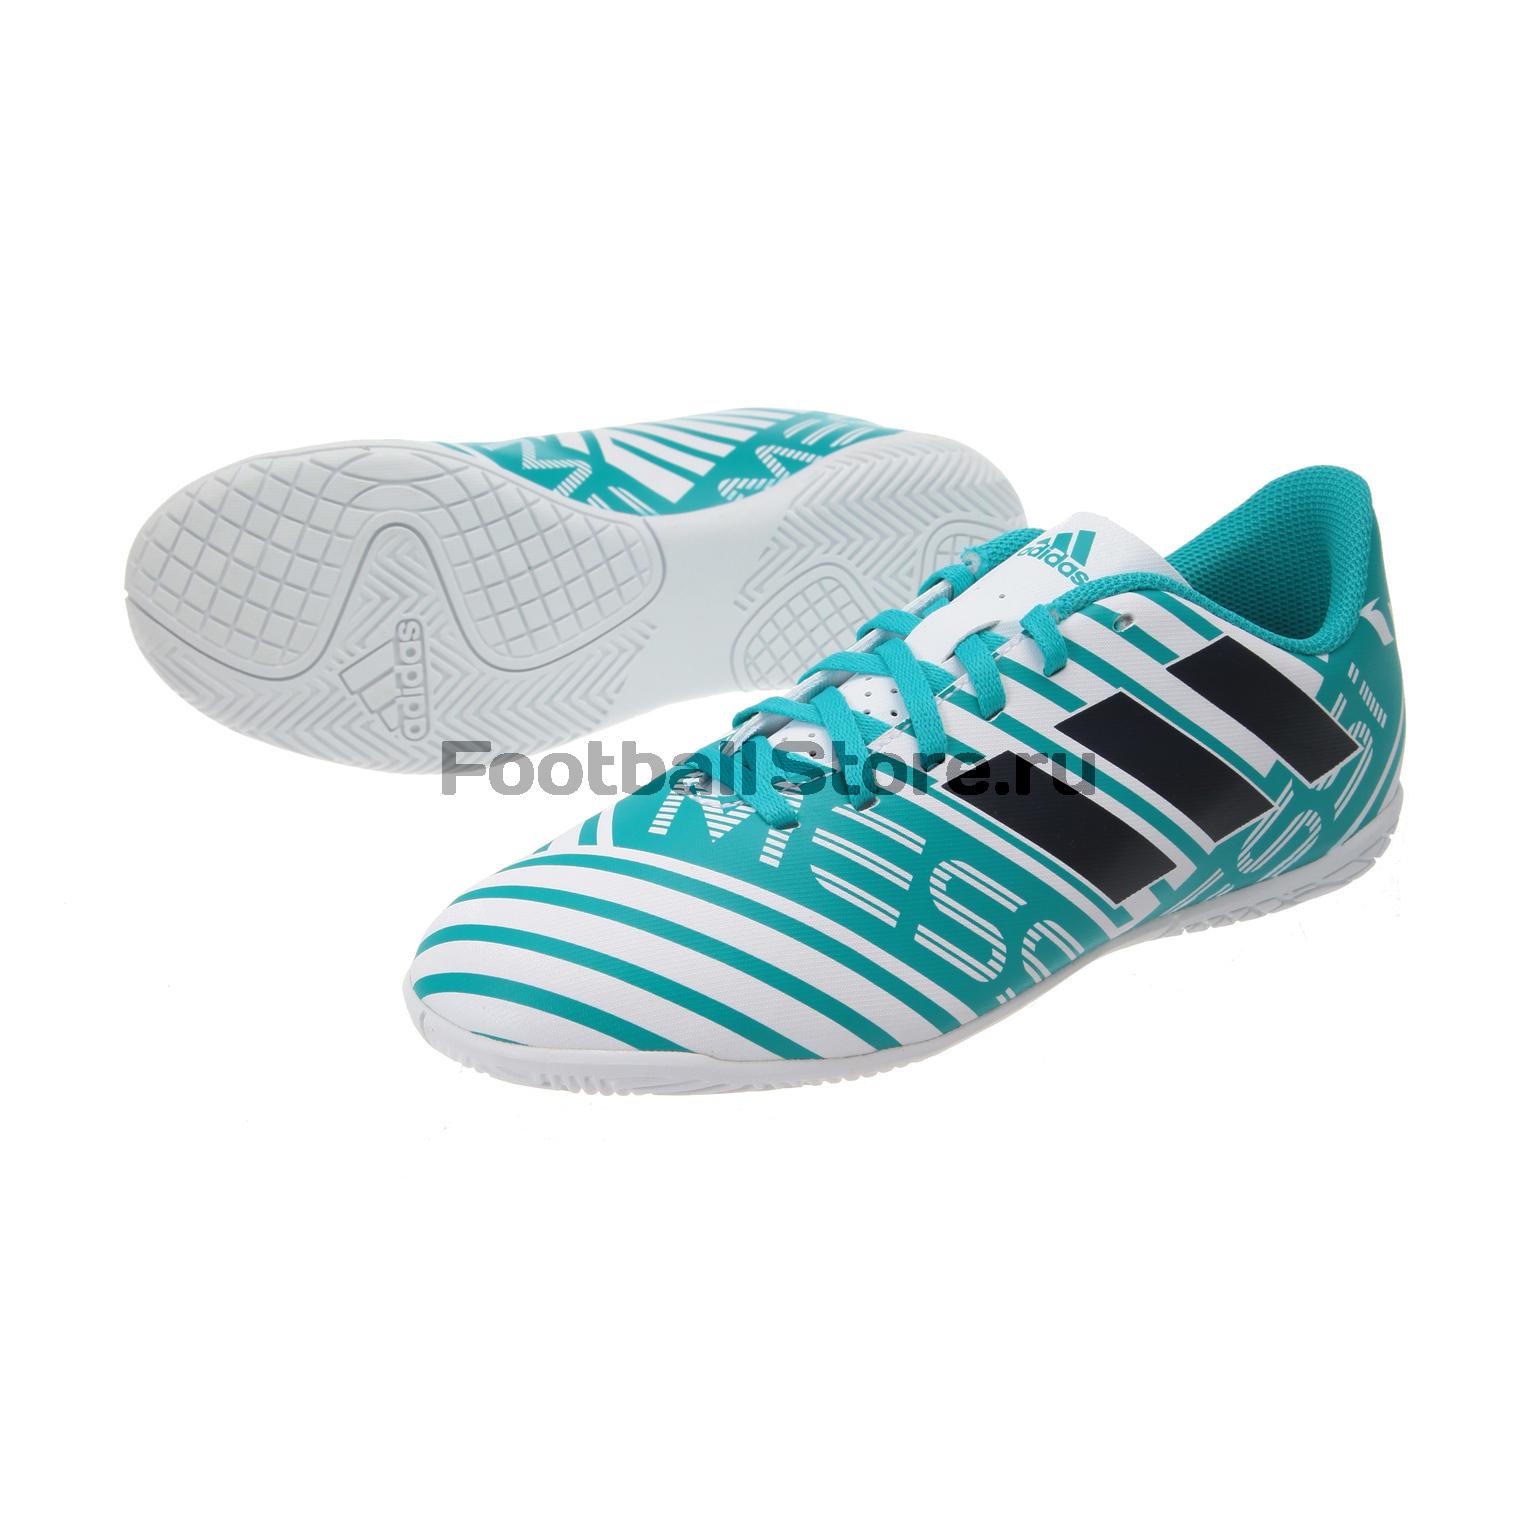 Бутсы Adidas Обувь для зала Adidas Nemeziz Messi 17.4 IN JR S77208 бутсы adidas бутсы для зала дет спорт messi 16 3 in j